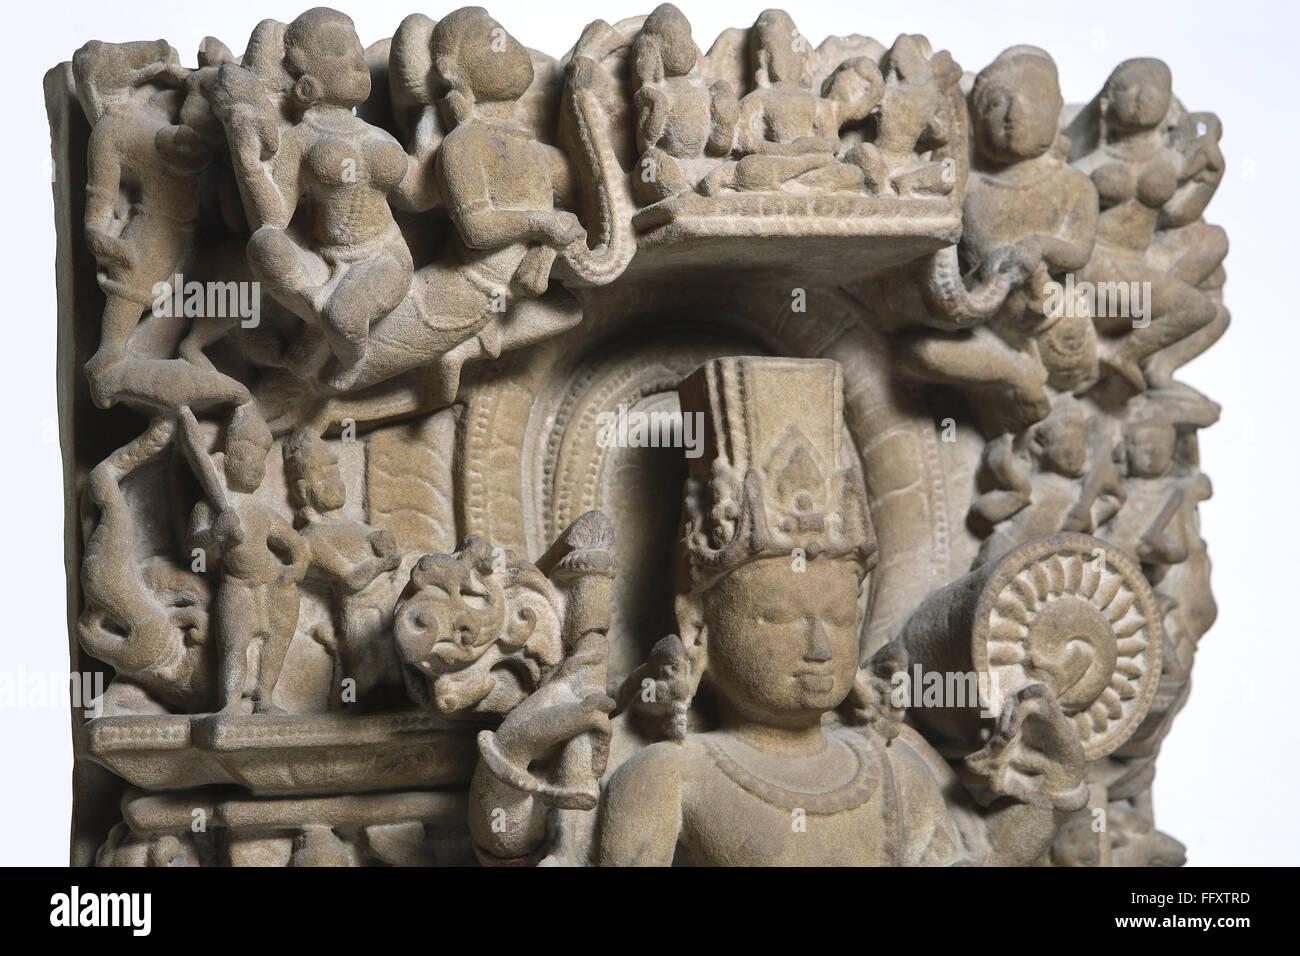 Close up upper portion of Vishnu 10th century AD Vaishnav cult Kalchurian period found at Jabalpur Madhya Pradesh - Stock Image